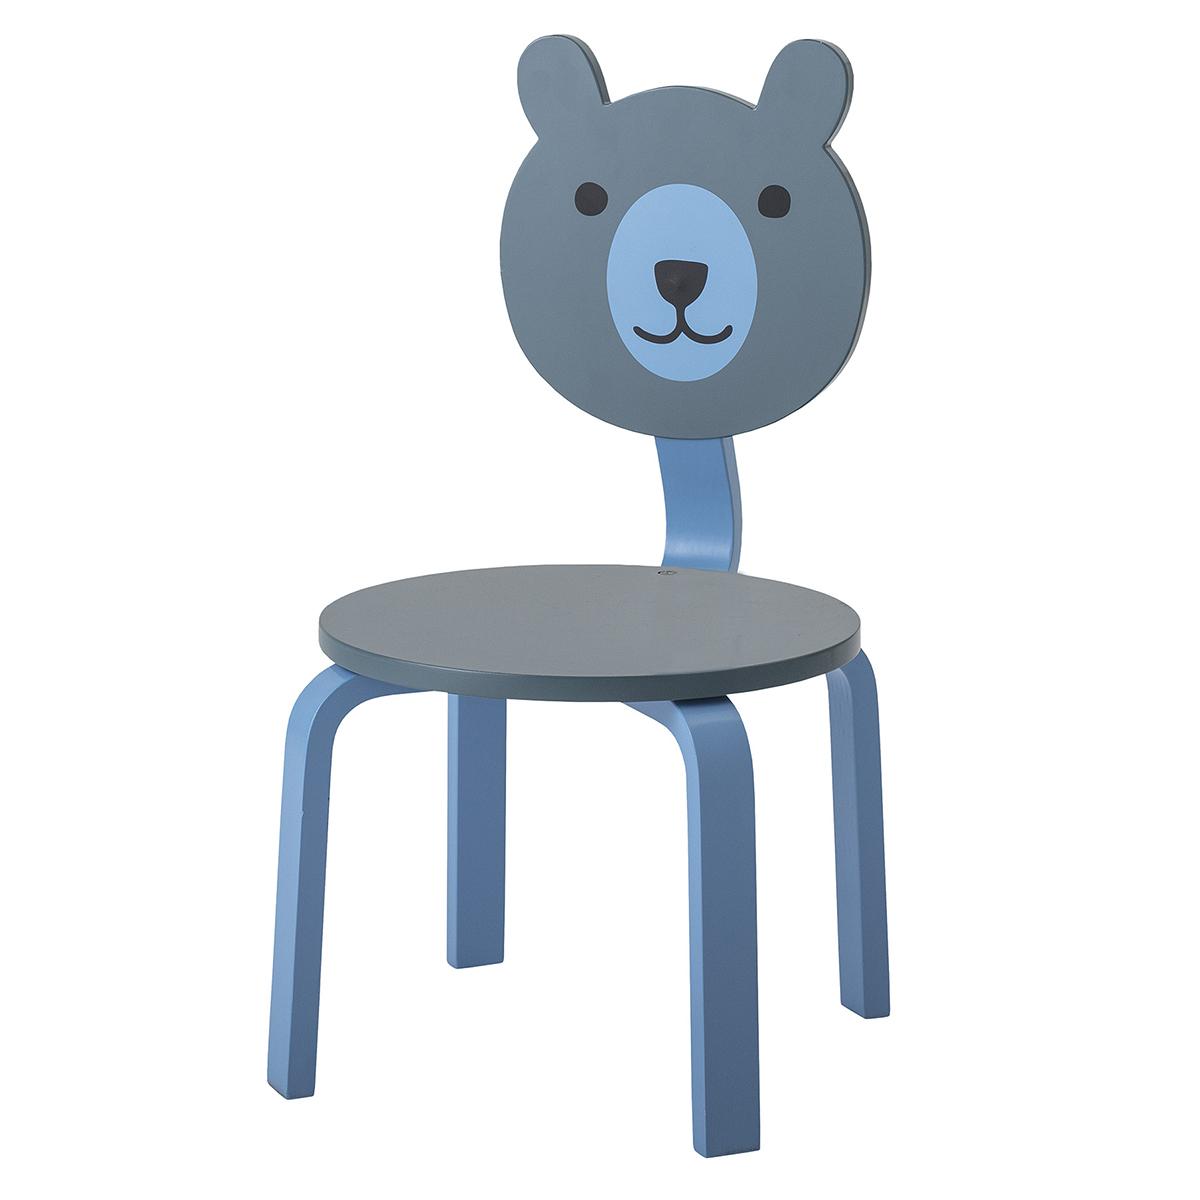 Table & Chaise Chaise Ours - Bleu Chaise Ours - Bleu